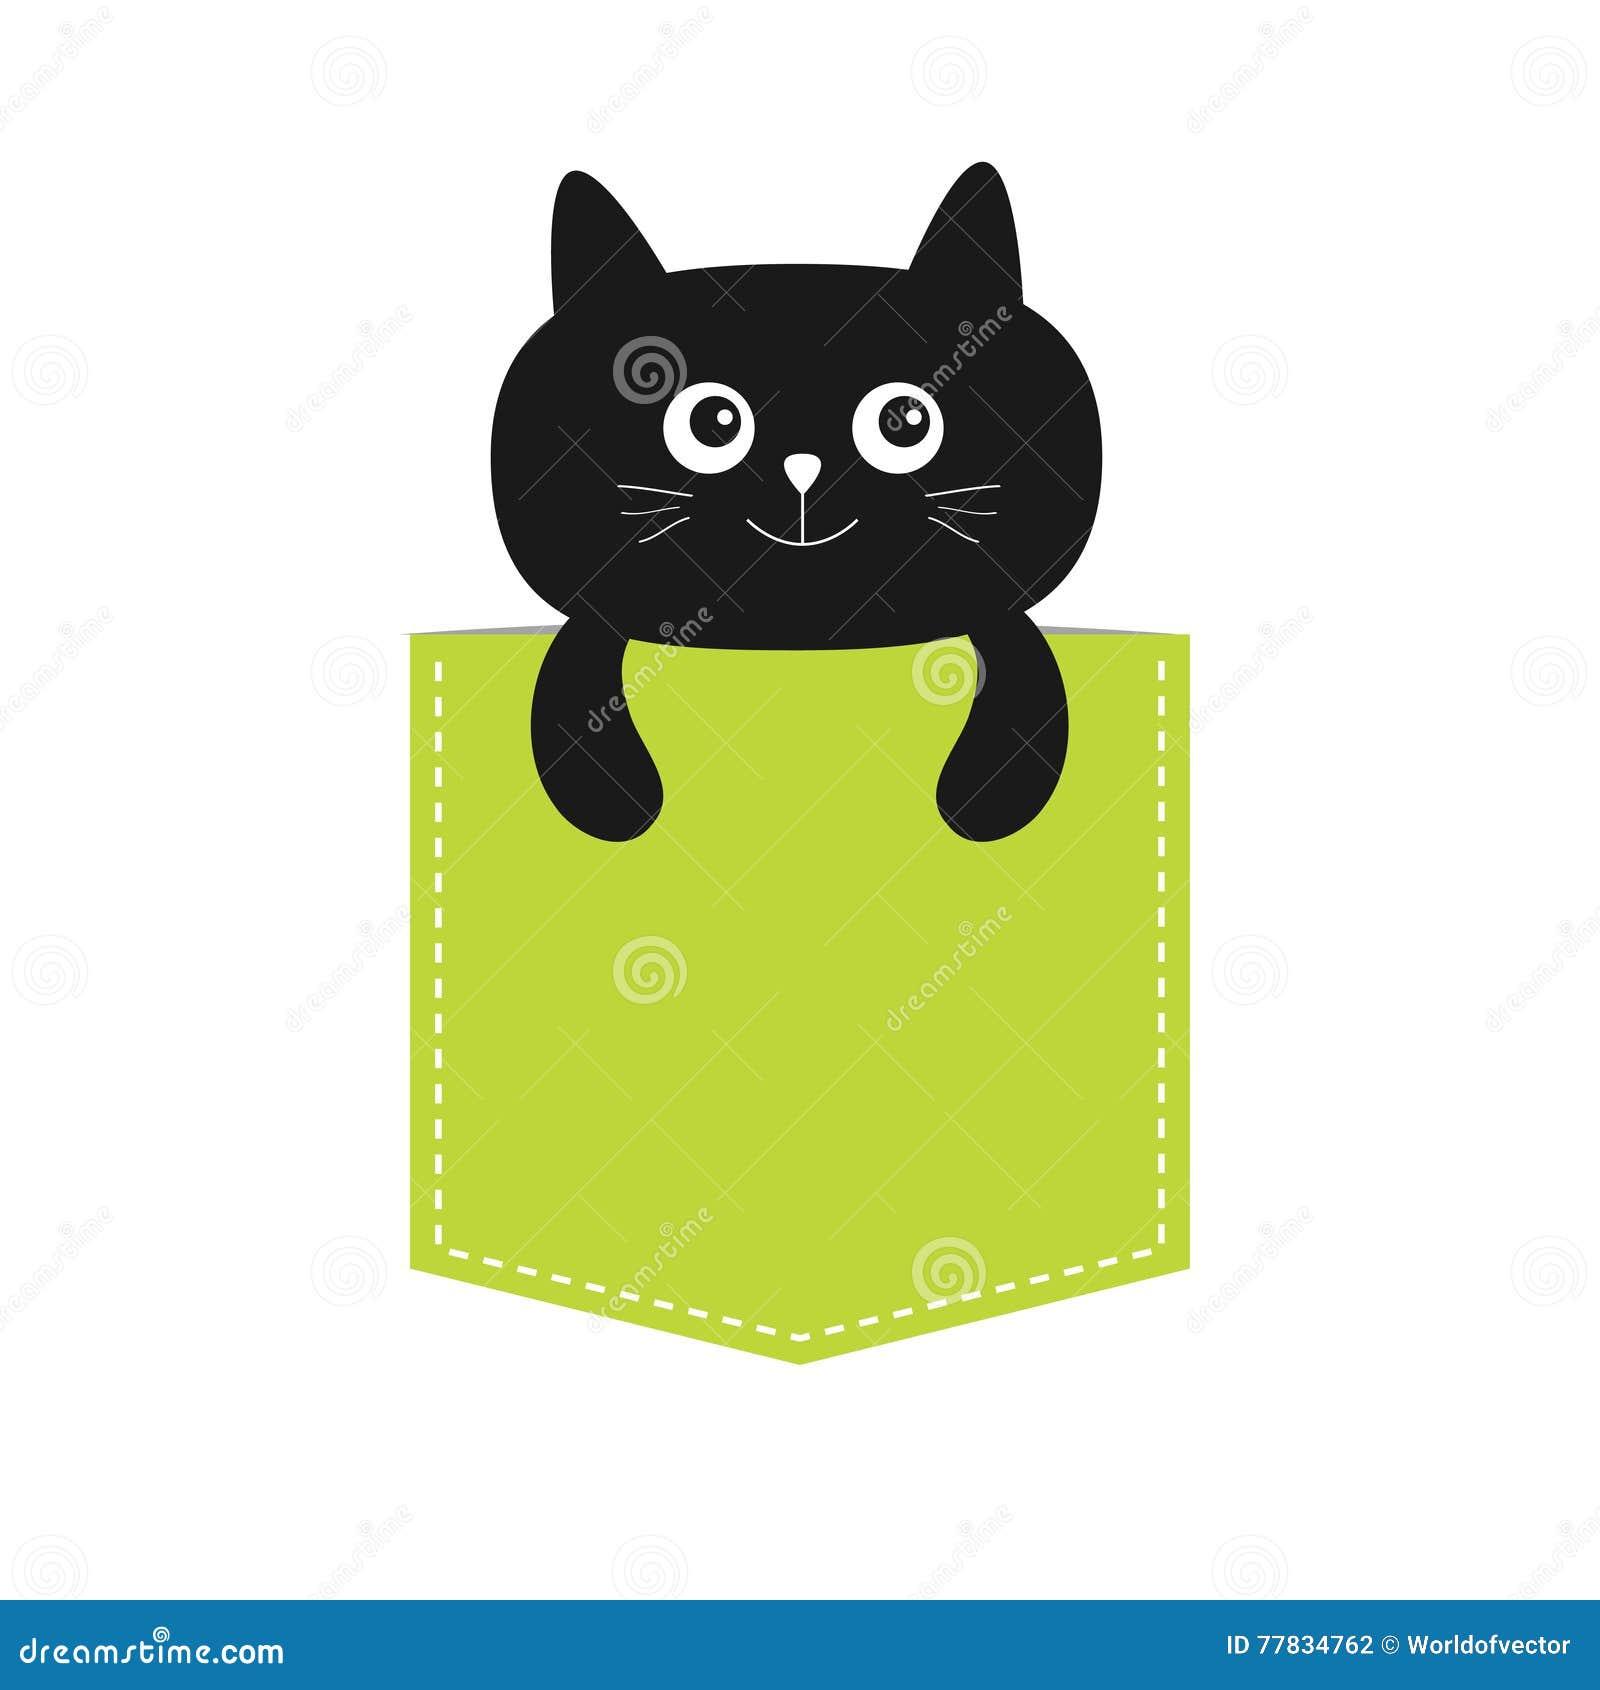 Shirt design black - T Shirt Design Cat In The Pocket Cute Cartoon Character Black Kitten Kitty Dash Line